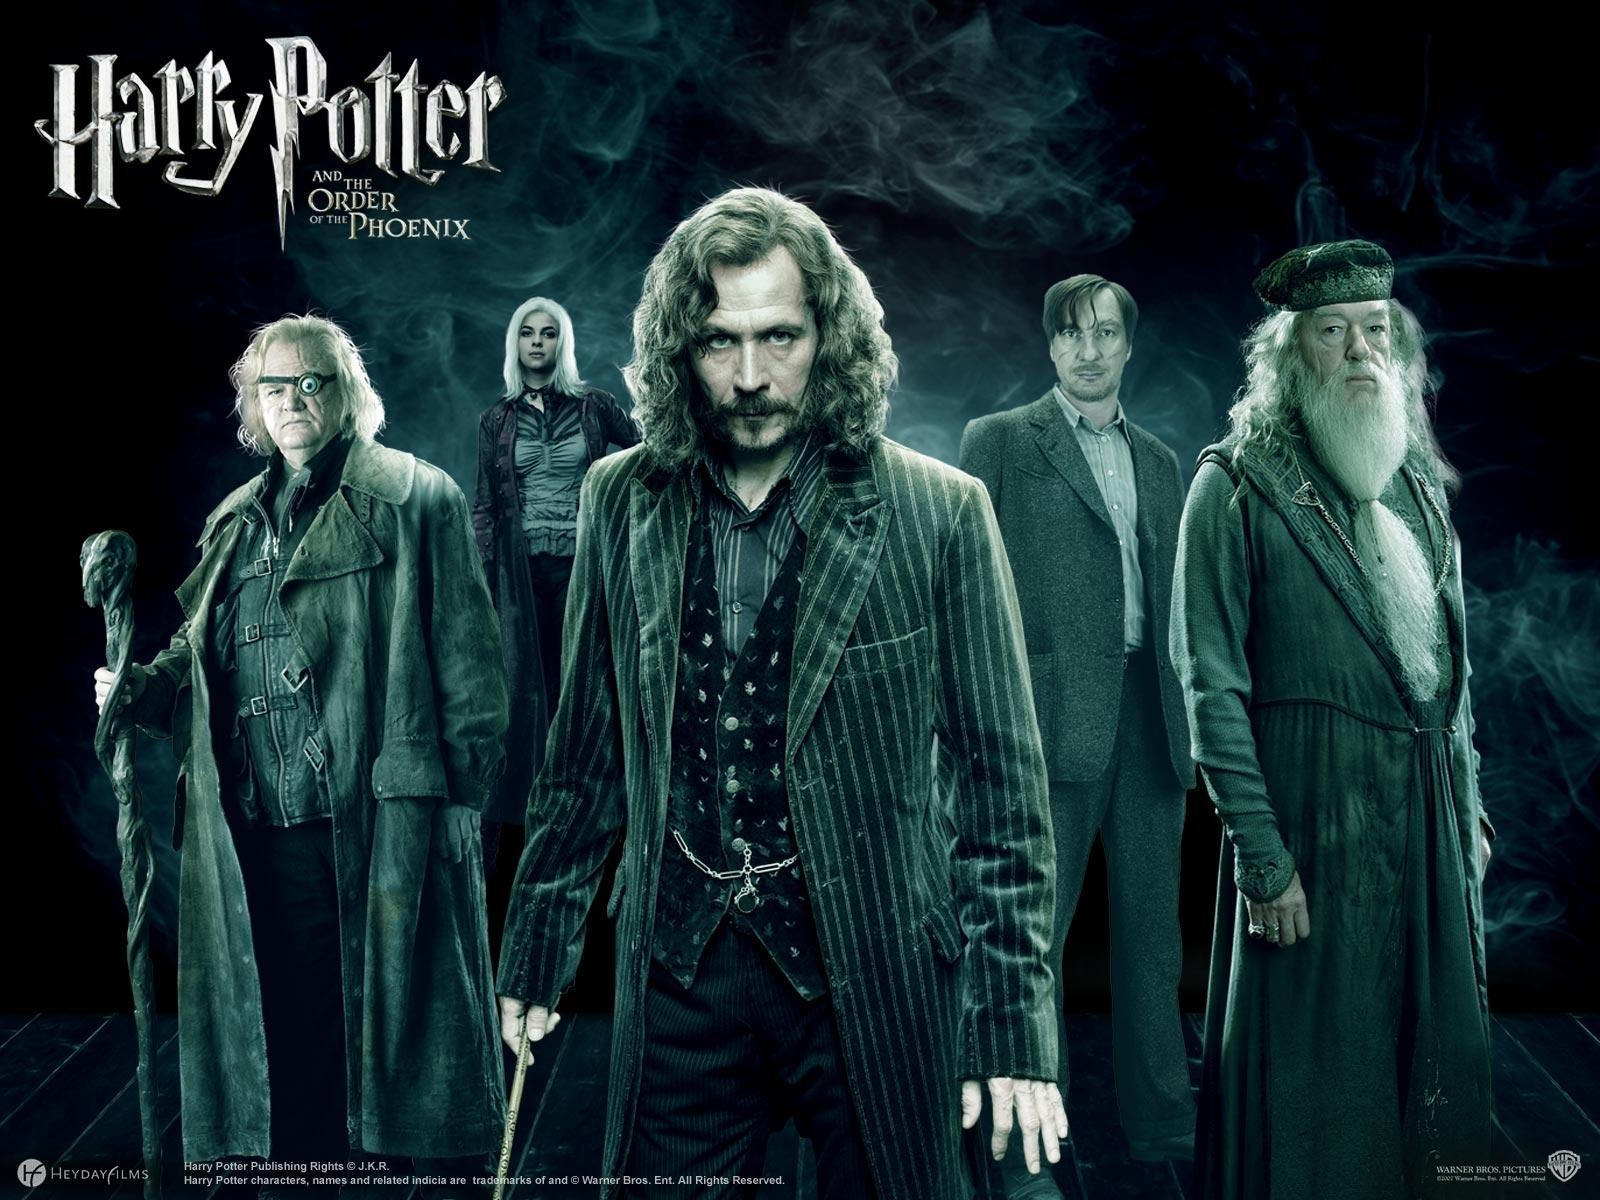 http://3.bp.blogspot.com/_eqPrIE5E1OM/THcjZ-xmioI/AAAAAAAAA1s/YUekbXW0Wj4/s1600/Harry-Potter-The-Order-Phoenix.jpg